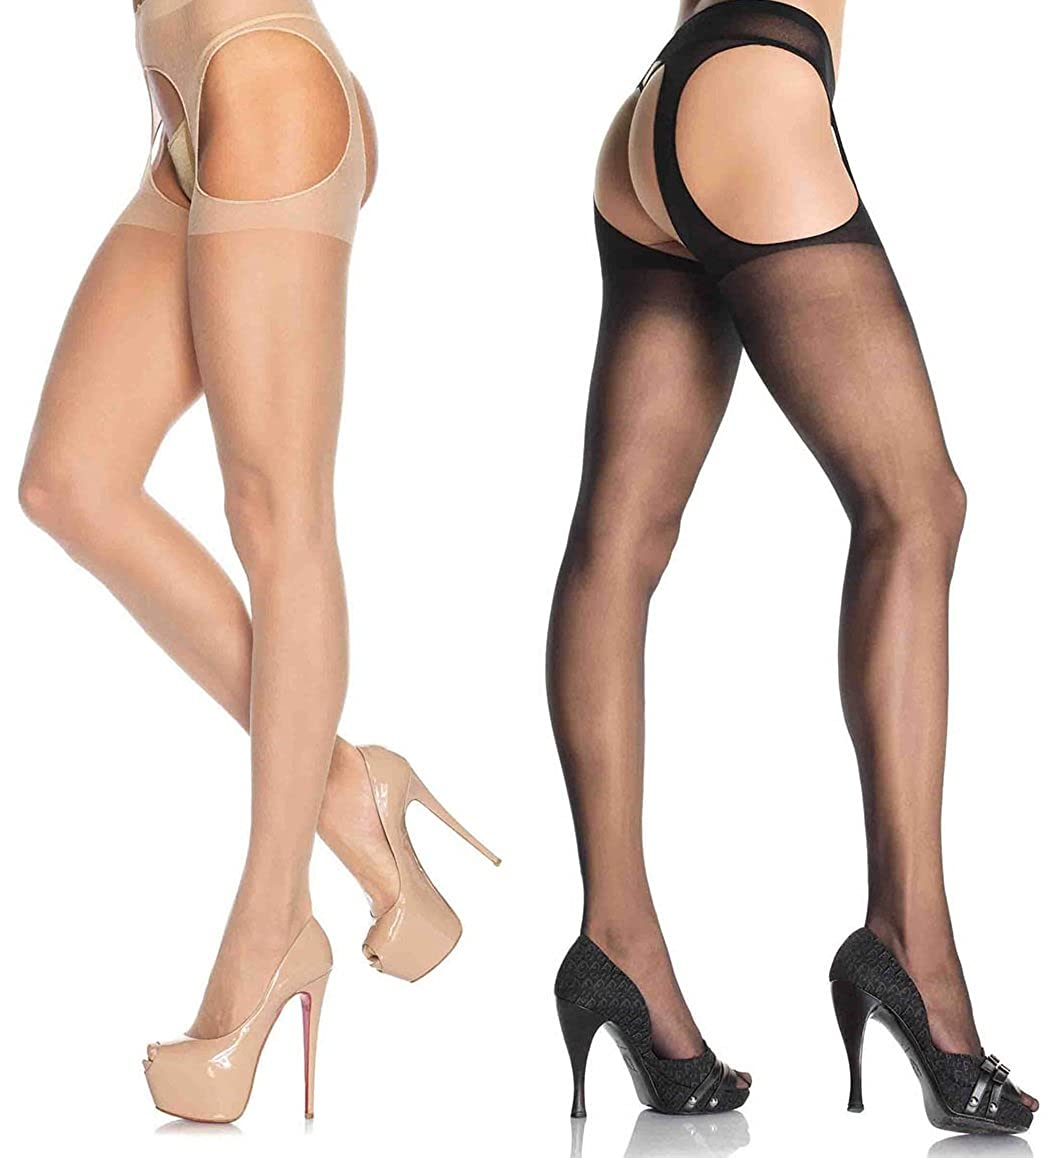 Leg Avenue Women's Sheer Garter Belt Pantyhose LA-1901Q